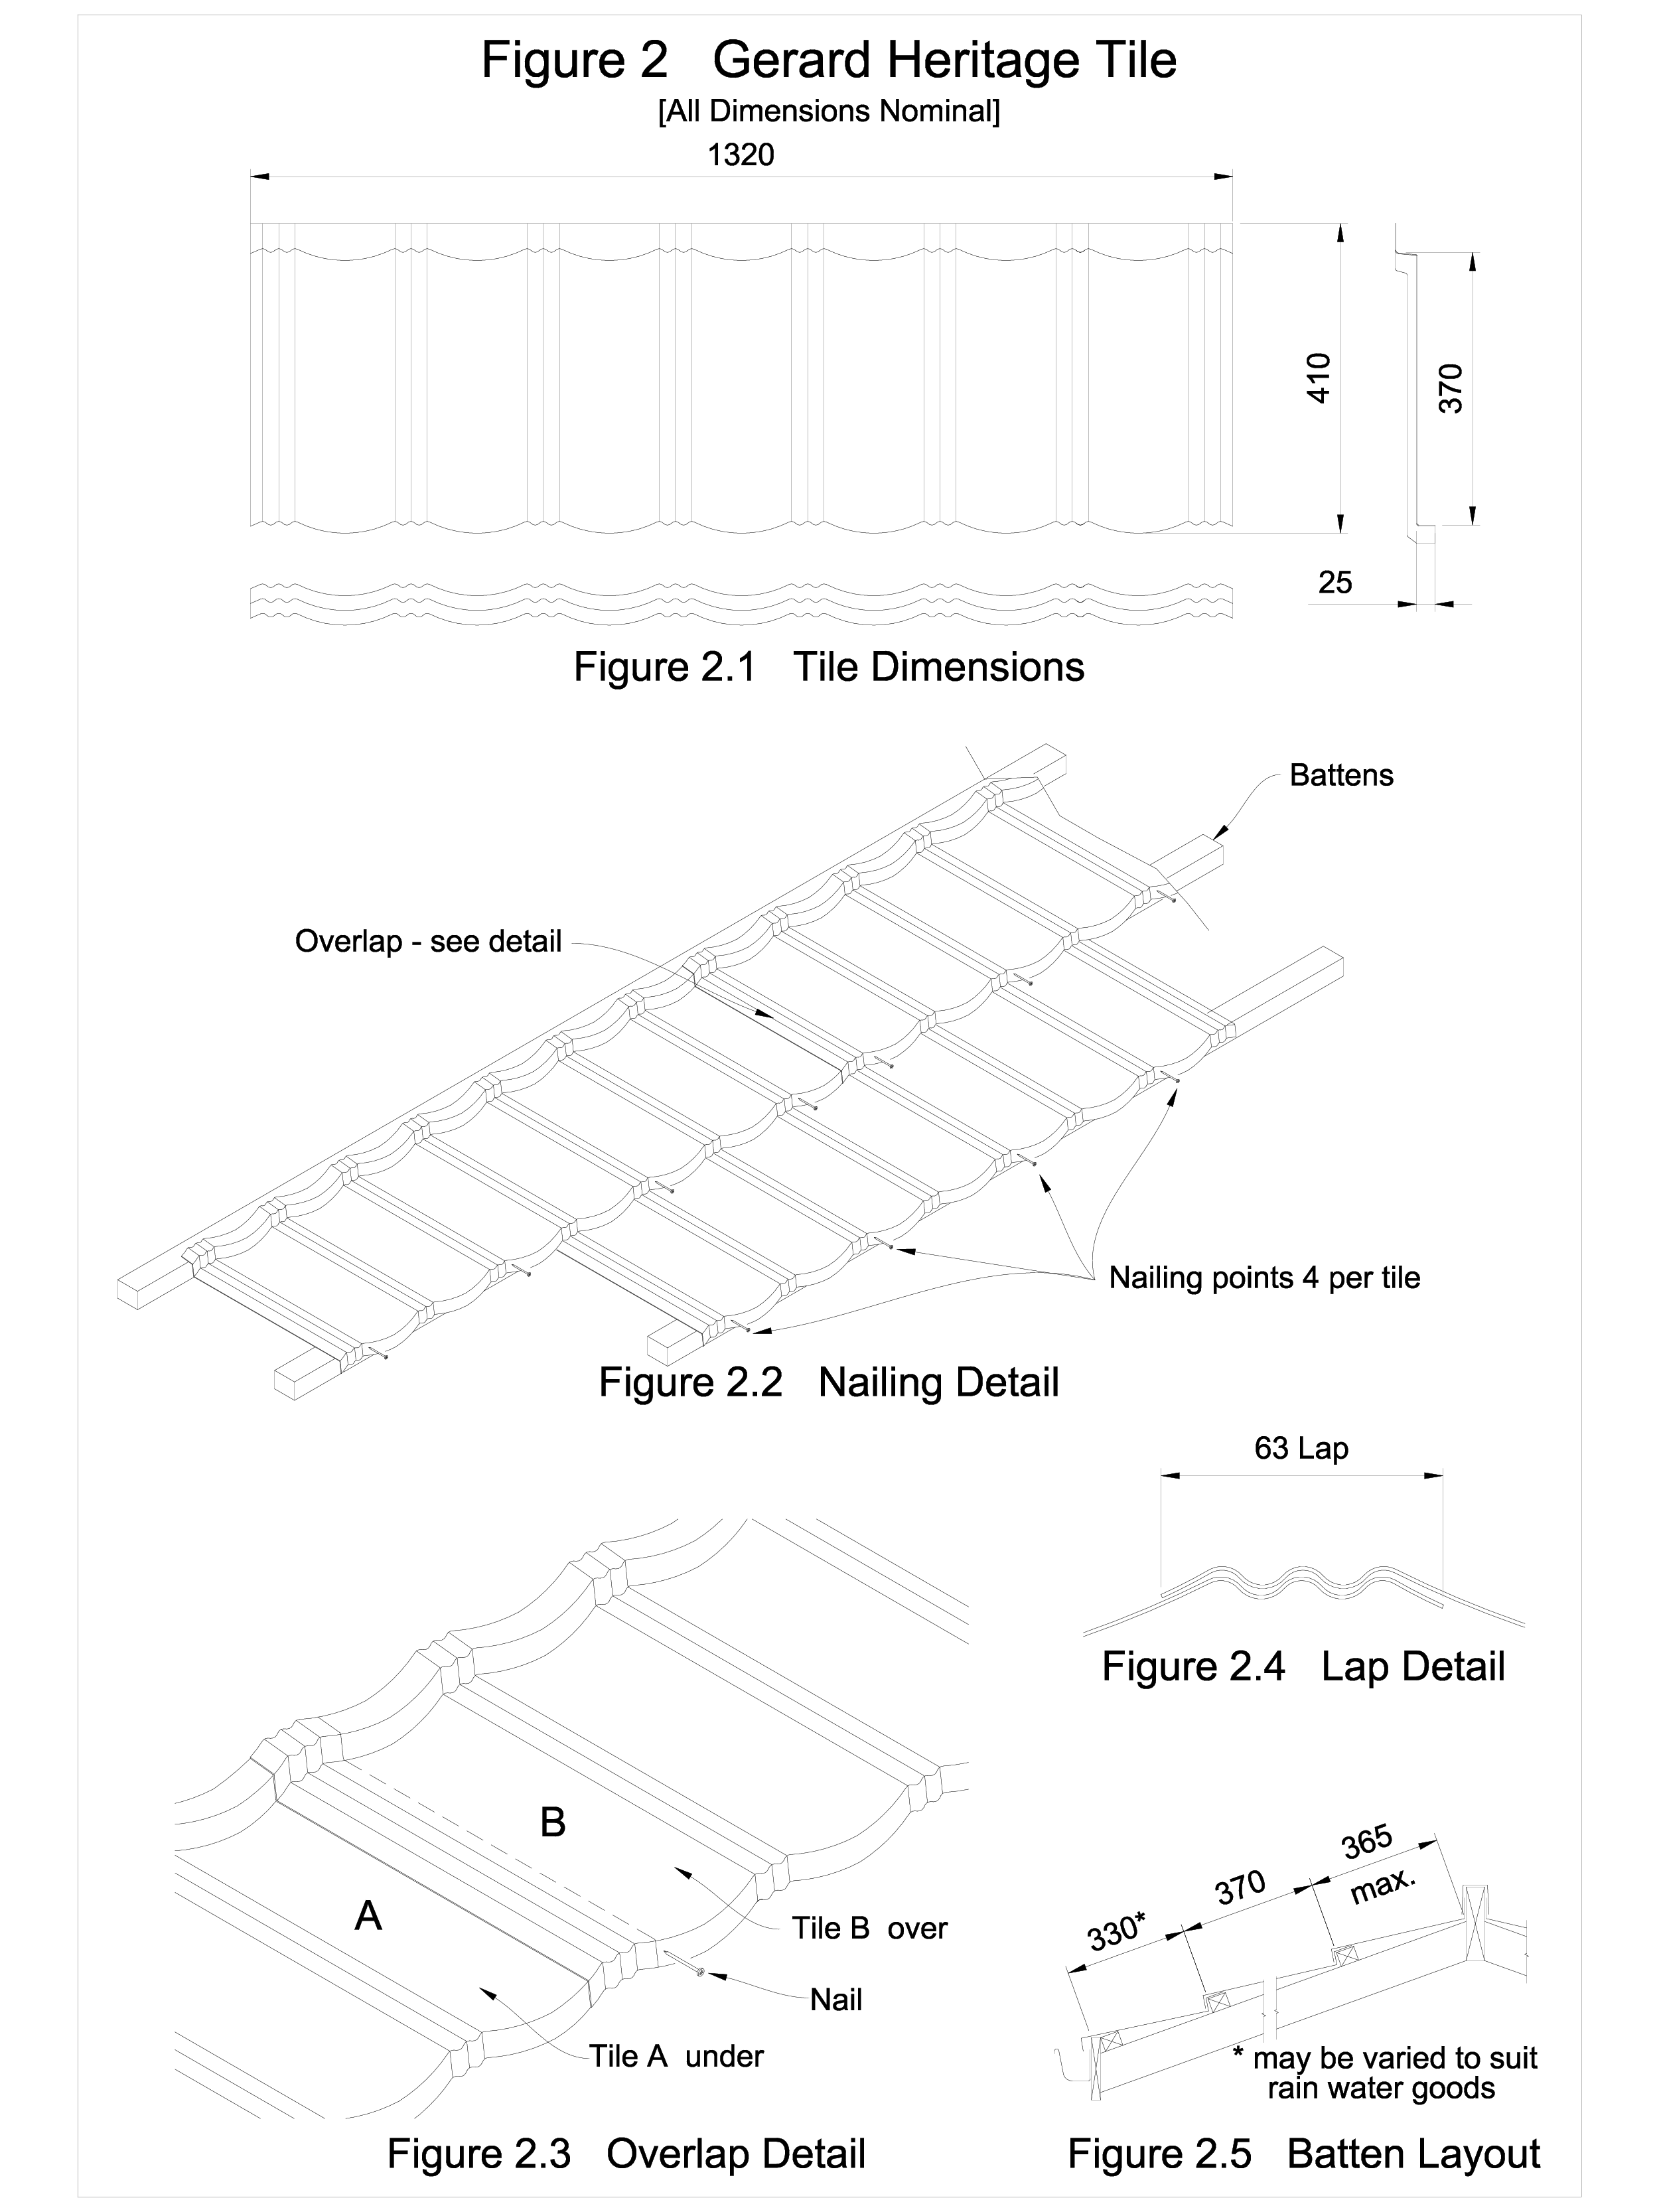 Detaliu de imbinare in camp, invelitori din tabla tip tigla HERITAGE GERARD Acoperis cu tigla metalica cu acoperire de piatra naturala FINAL DISTRIBUTION  - Pagina 1